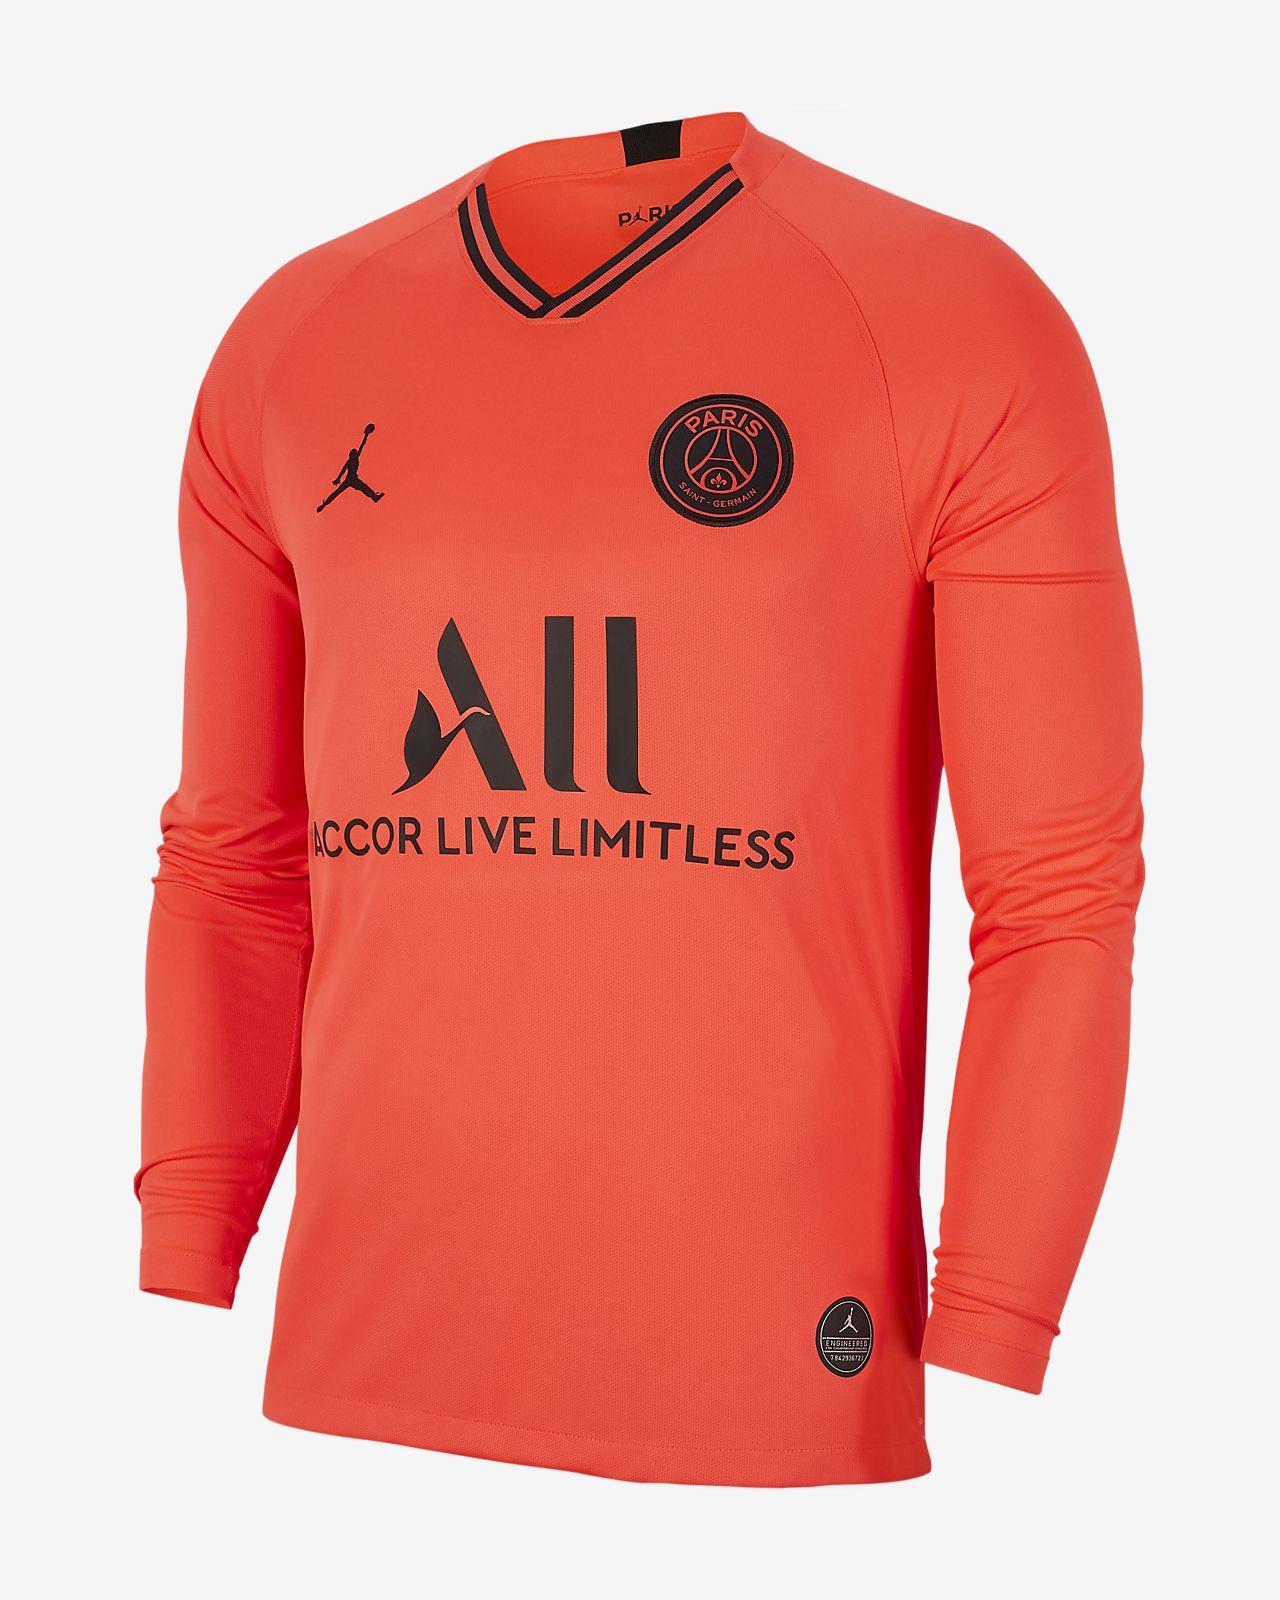 b3a1f1acefa892 ... Męska koszulka piłkarska z długim rękawem Paris Saint-Germain 2019/20  Stadium Away